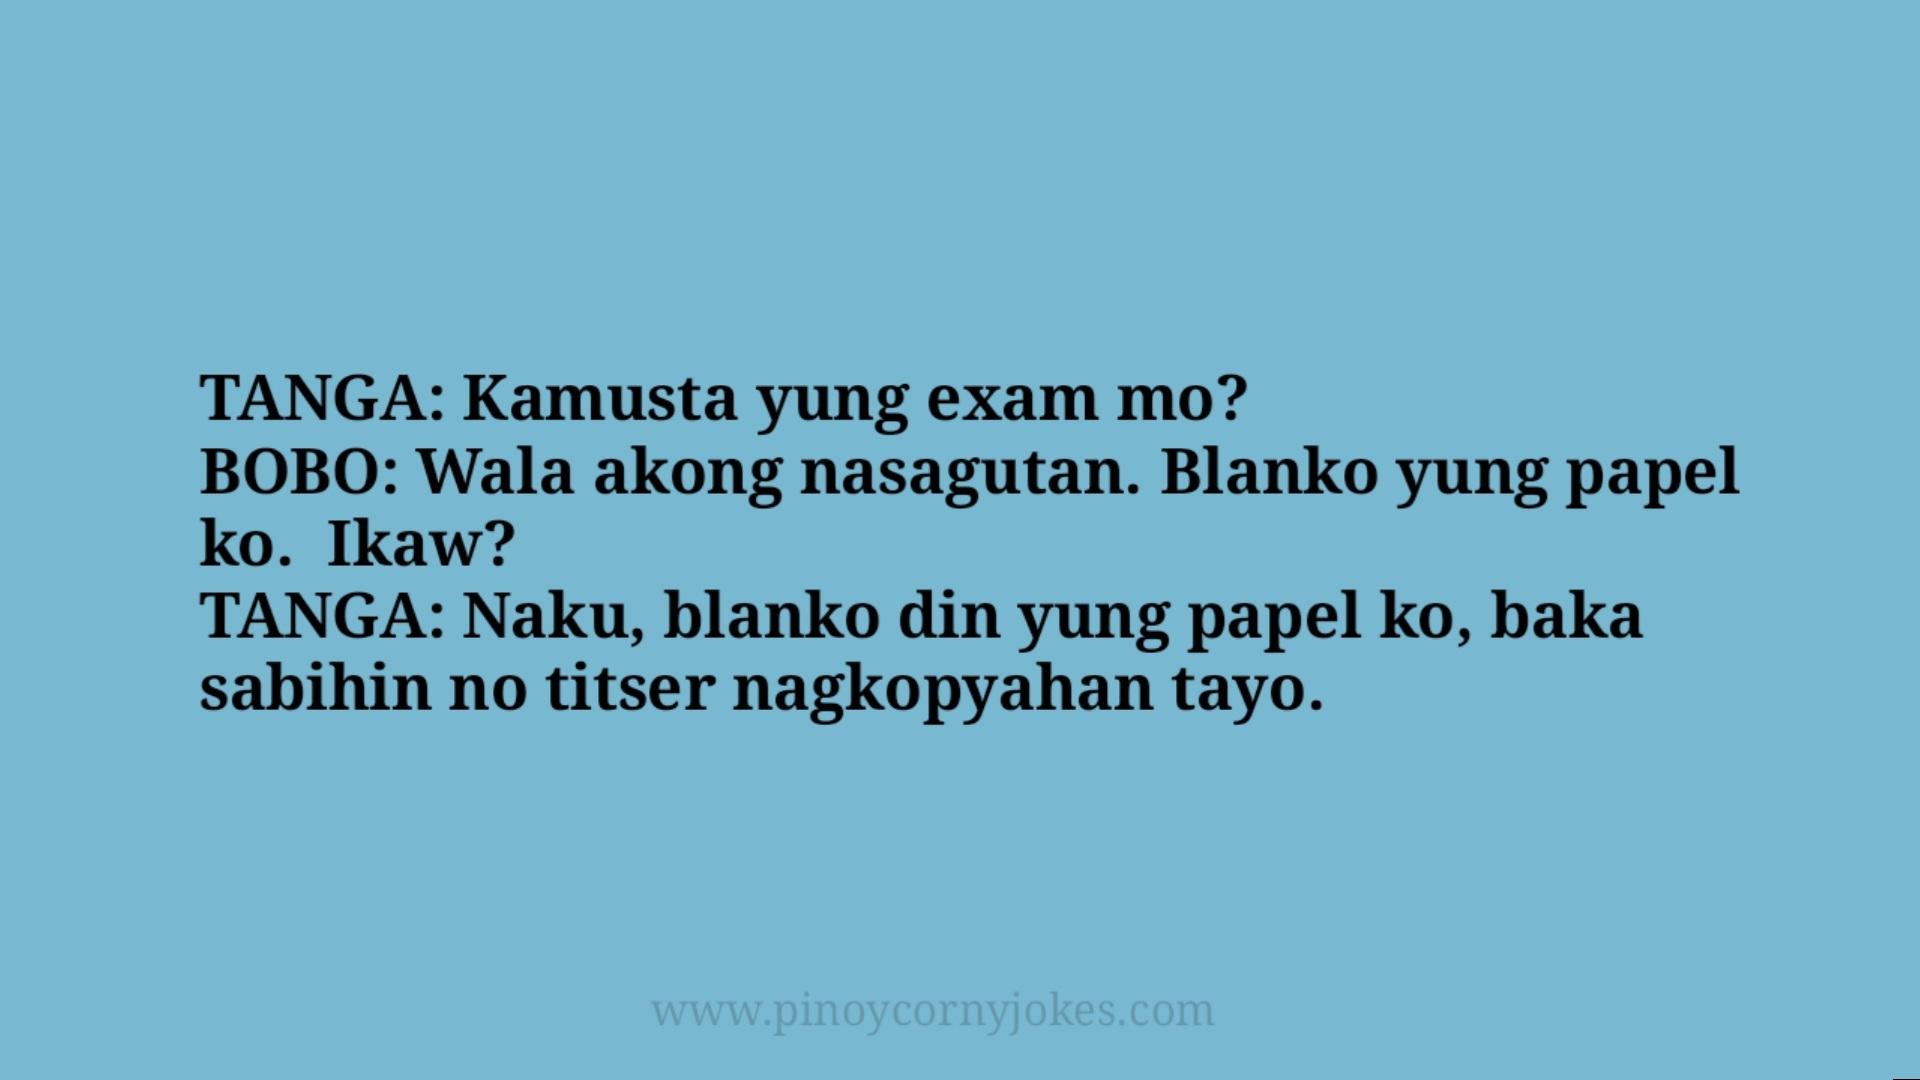 kamusta exam pinoy tanga jokes